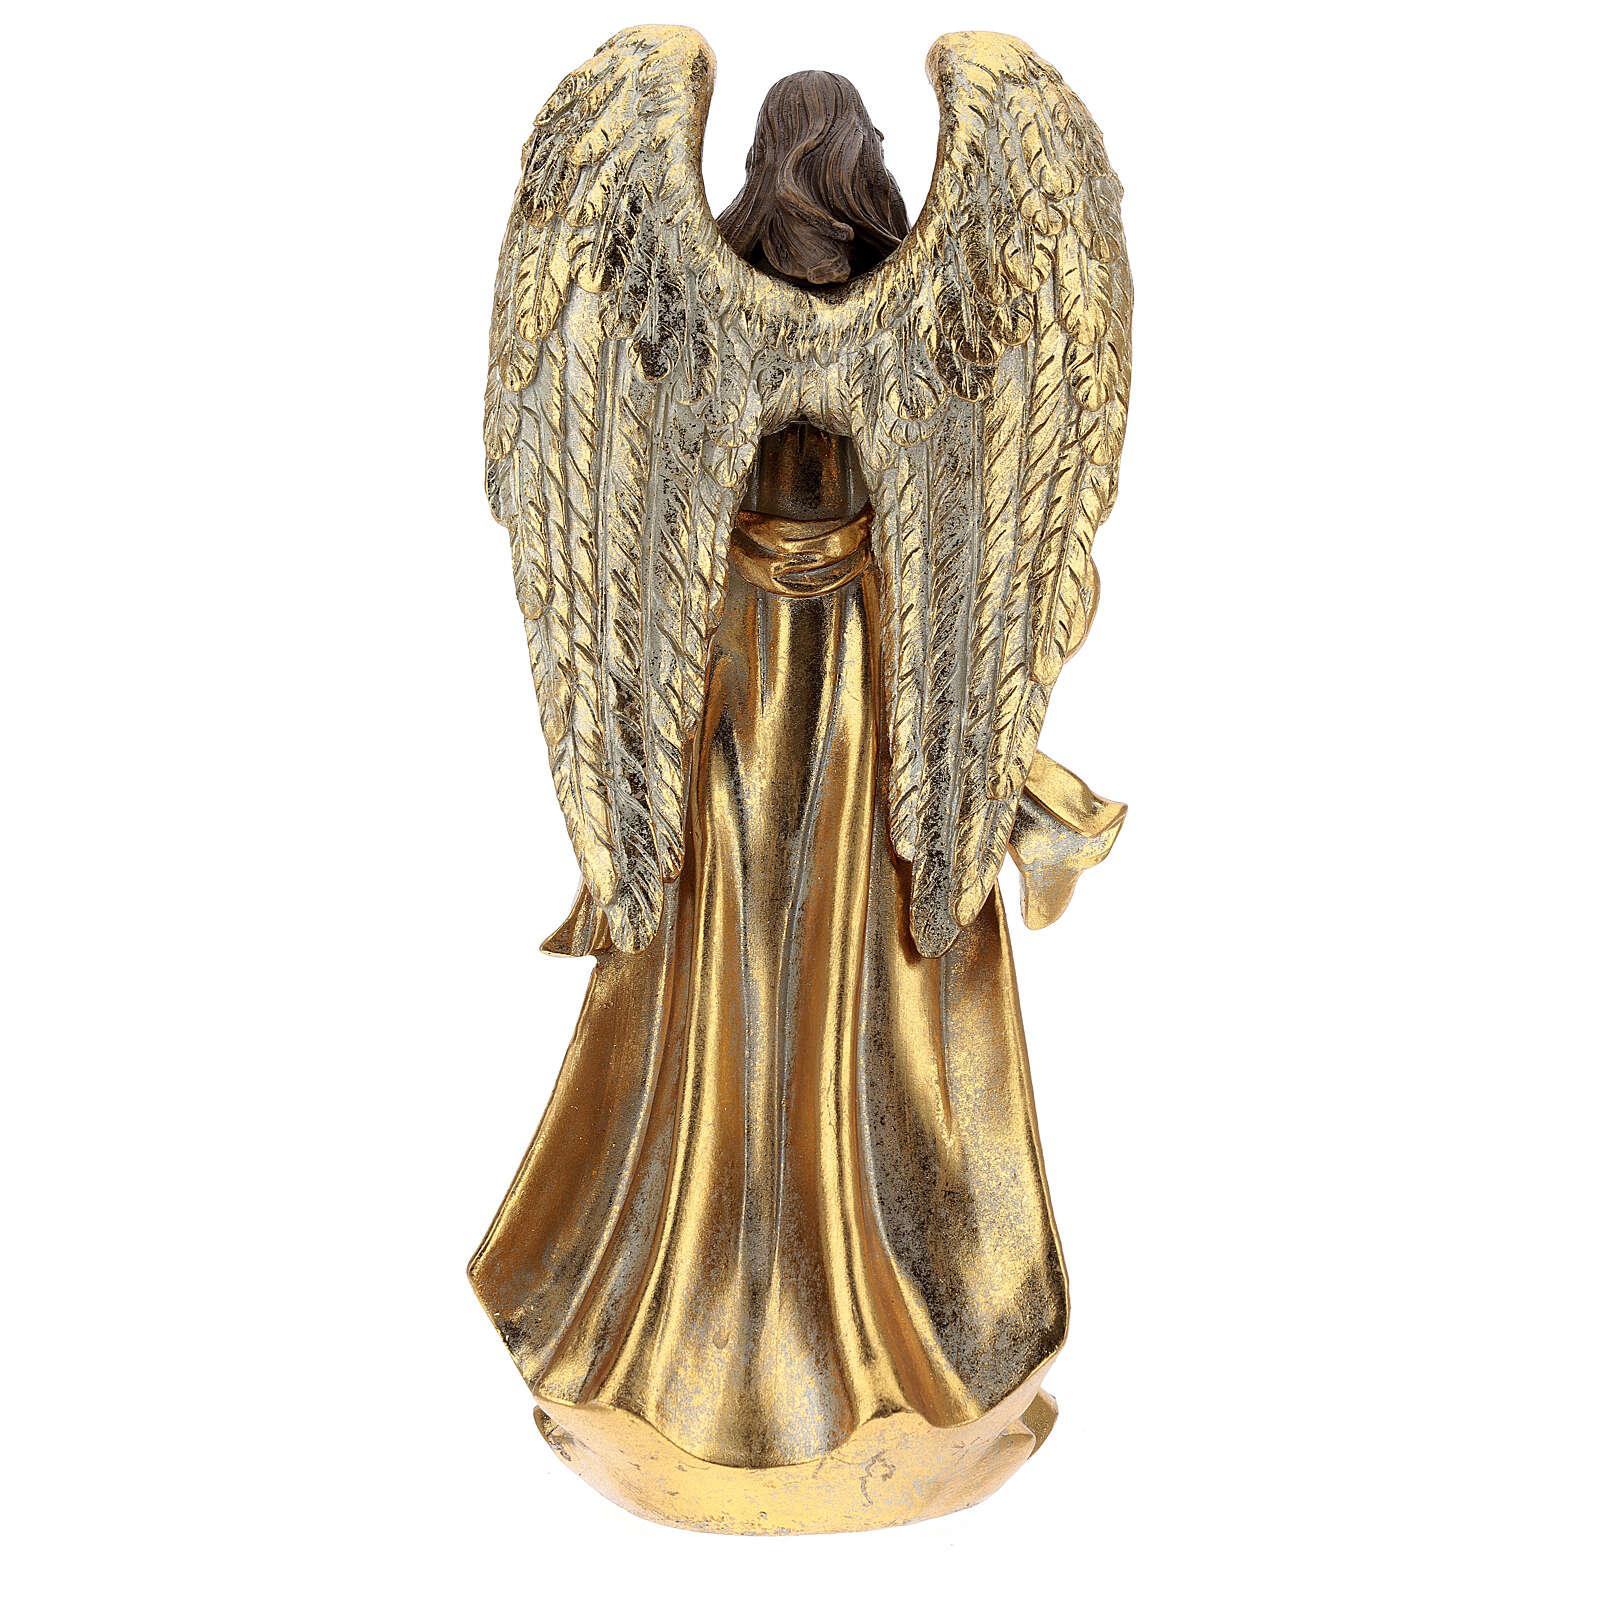 Angelo natalizio 35 cm con ghirlanda color oro 3